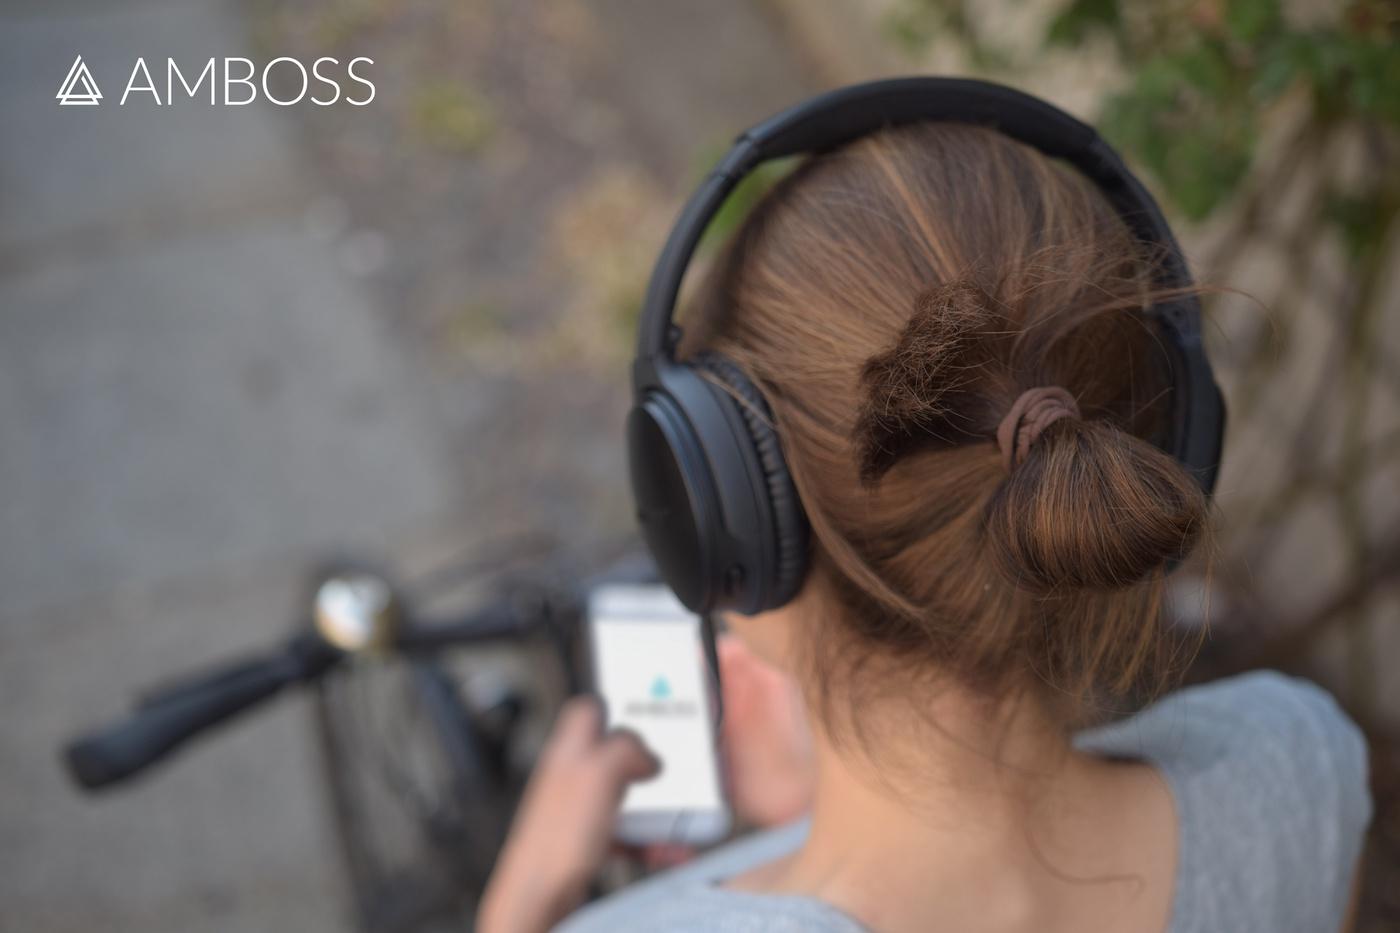 AMBOSS Podcast – Medizin zum Hören